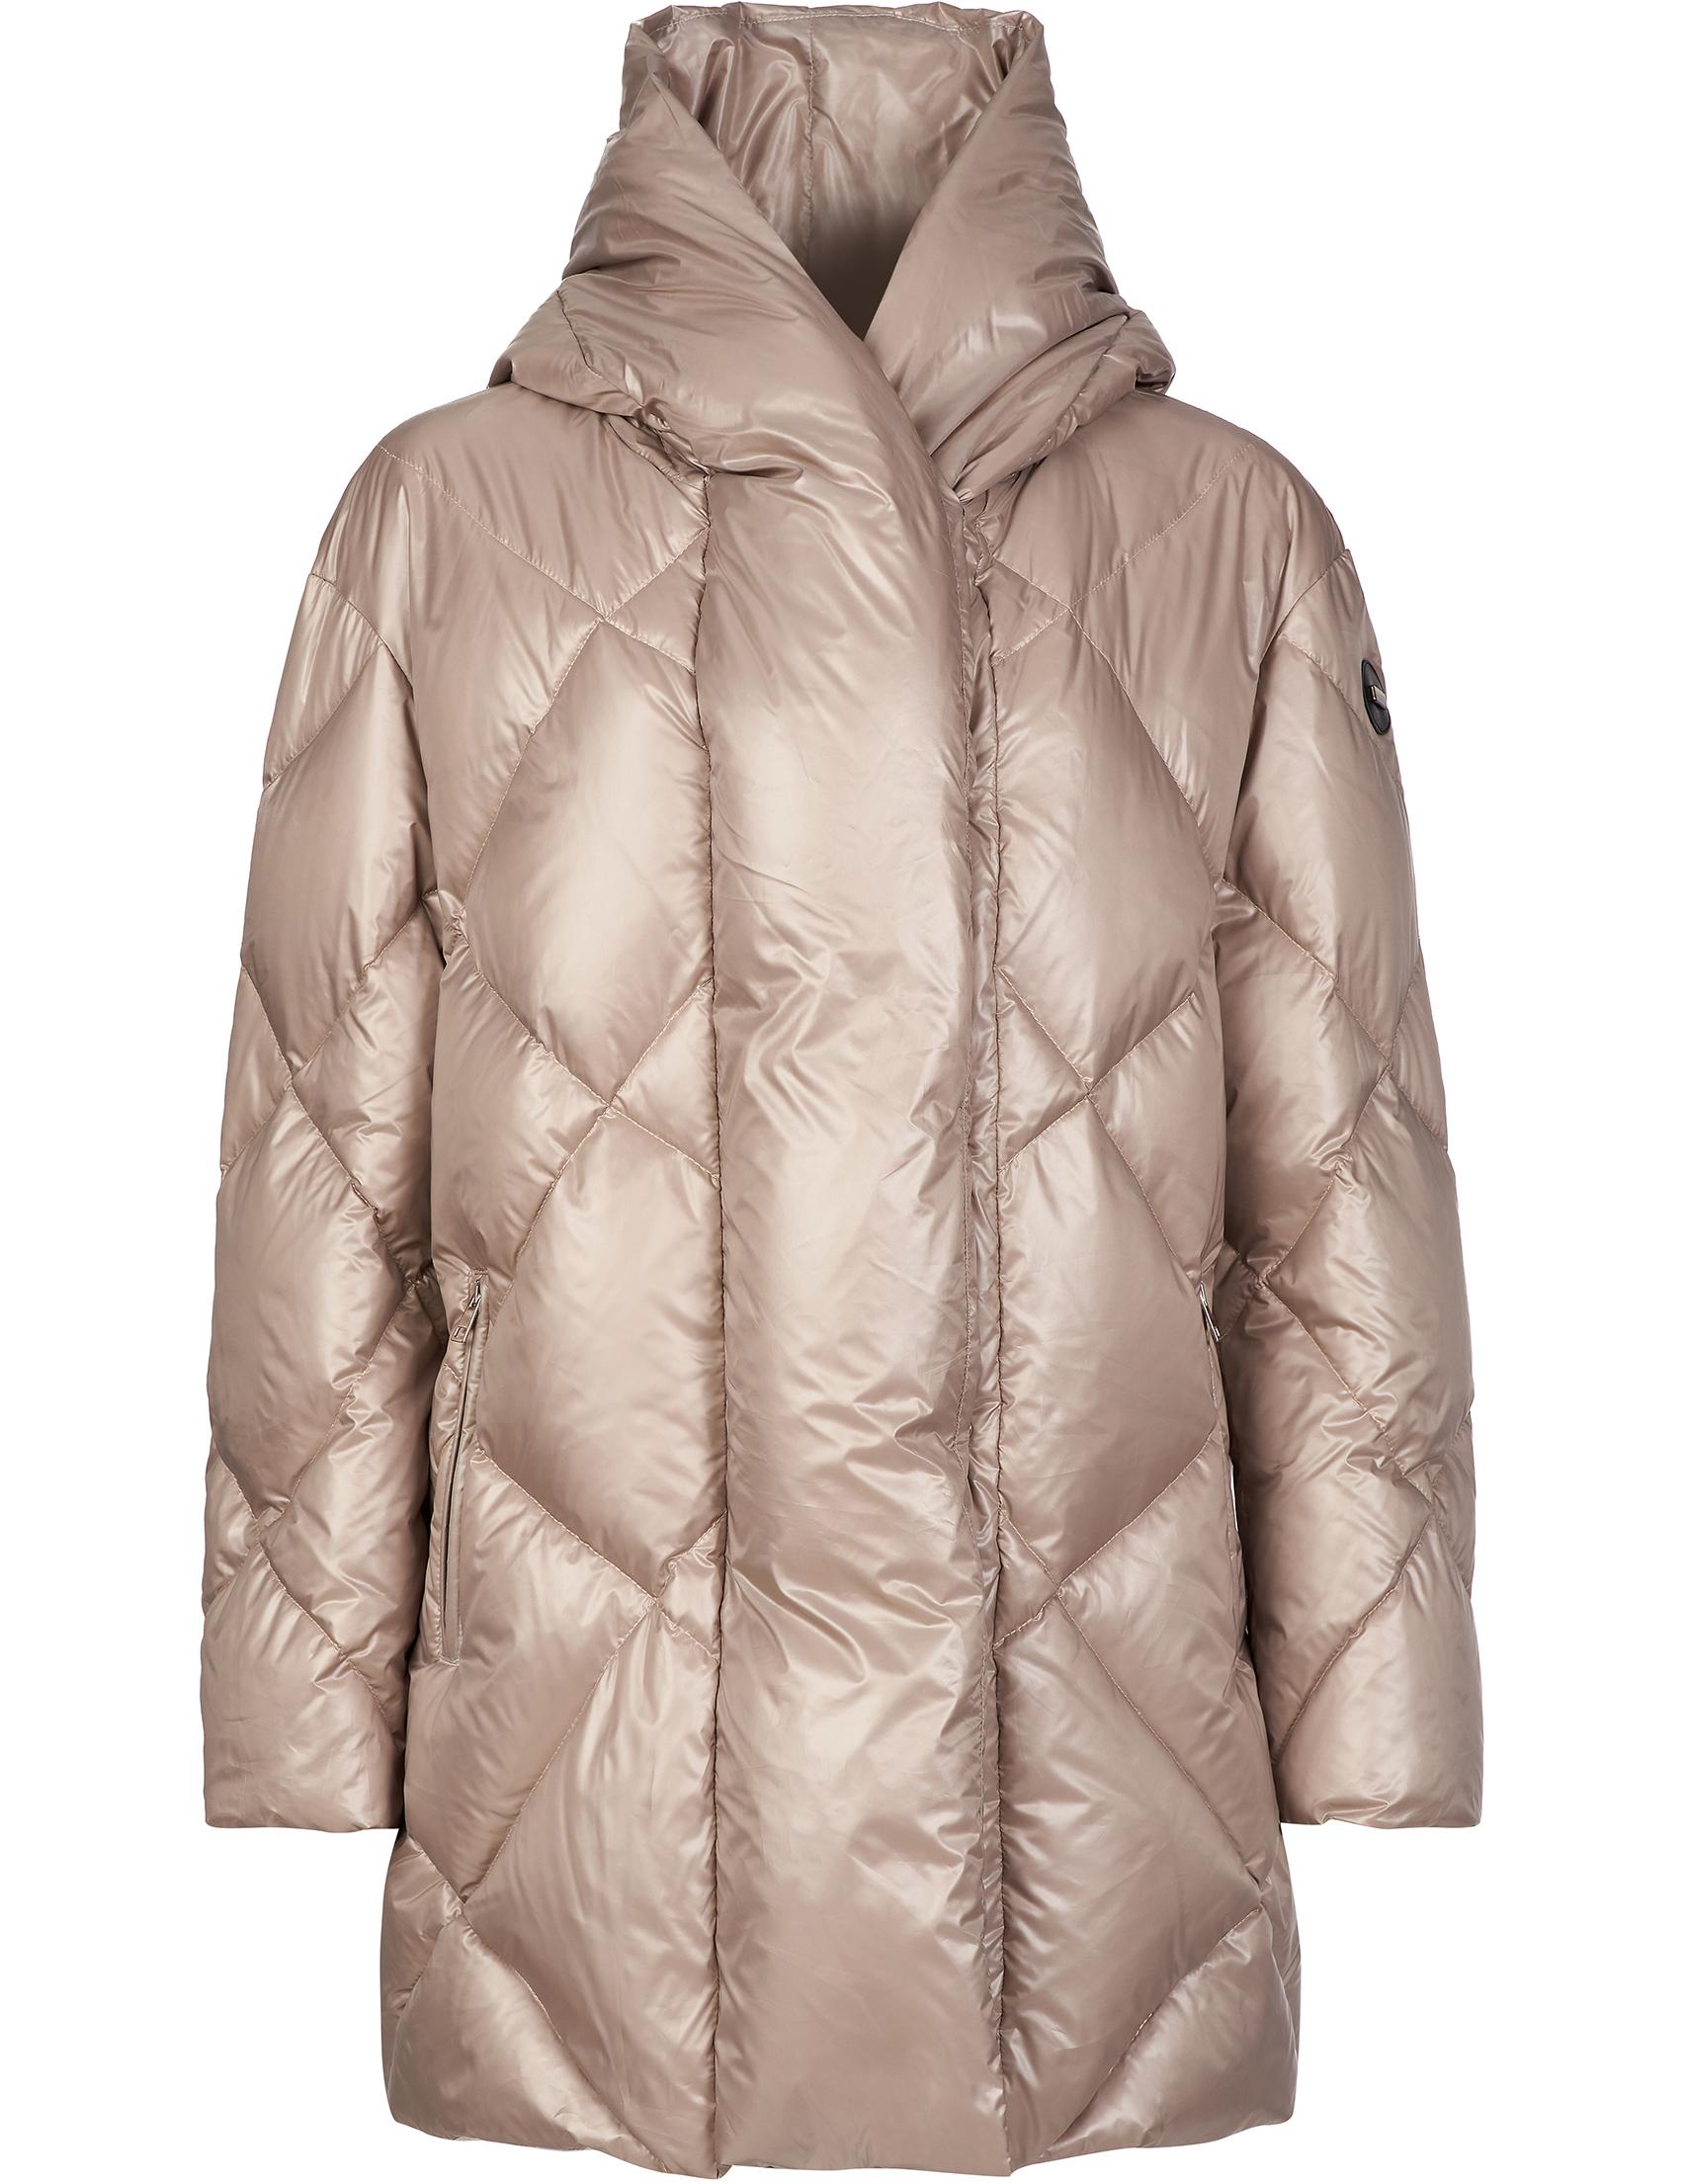 Купить Куртки, Куртка, GALLOTTI, Бежевый, 55%Полиэстер 37%Полиамид 8%Полиуритан;100%Полиэстер, Осень-Зима